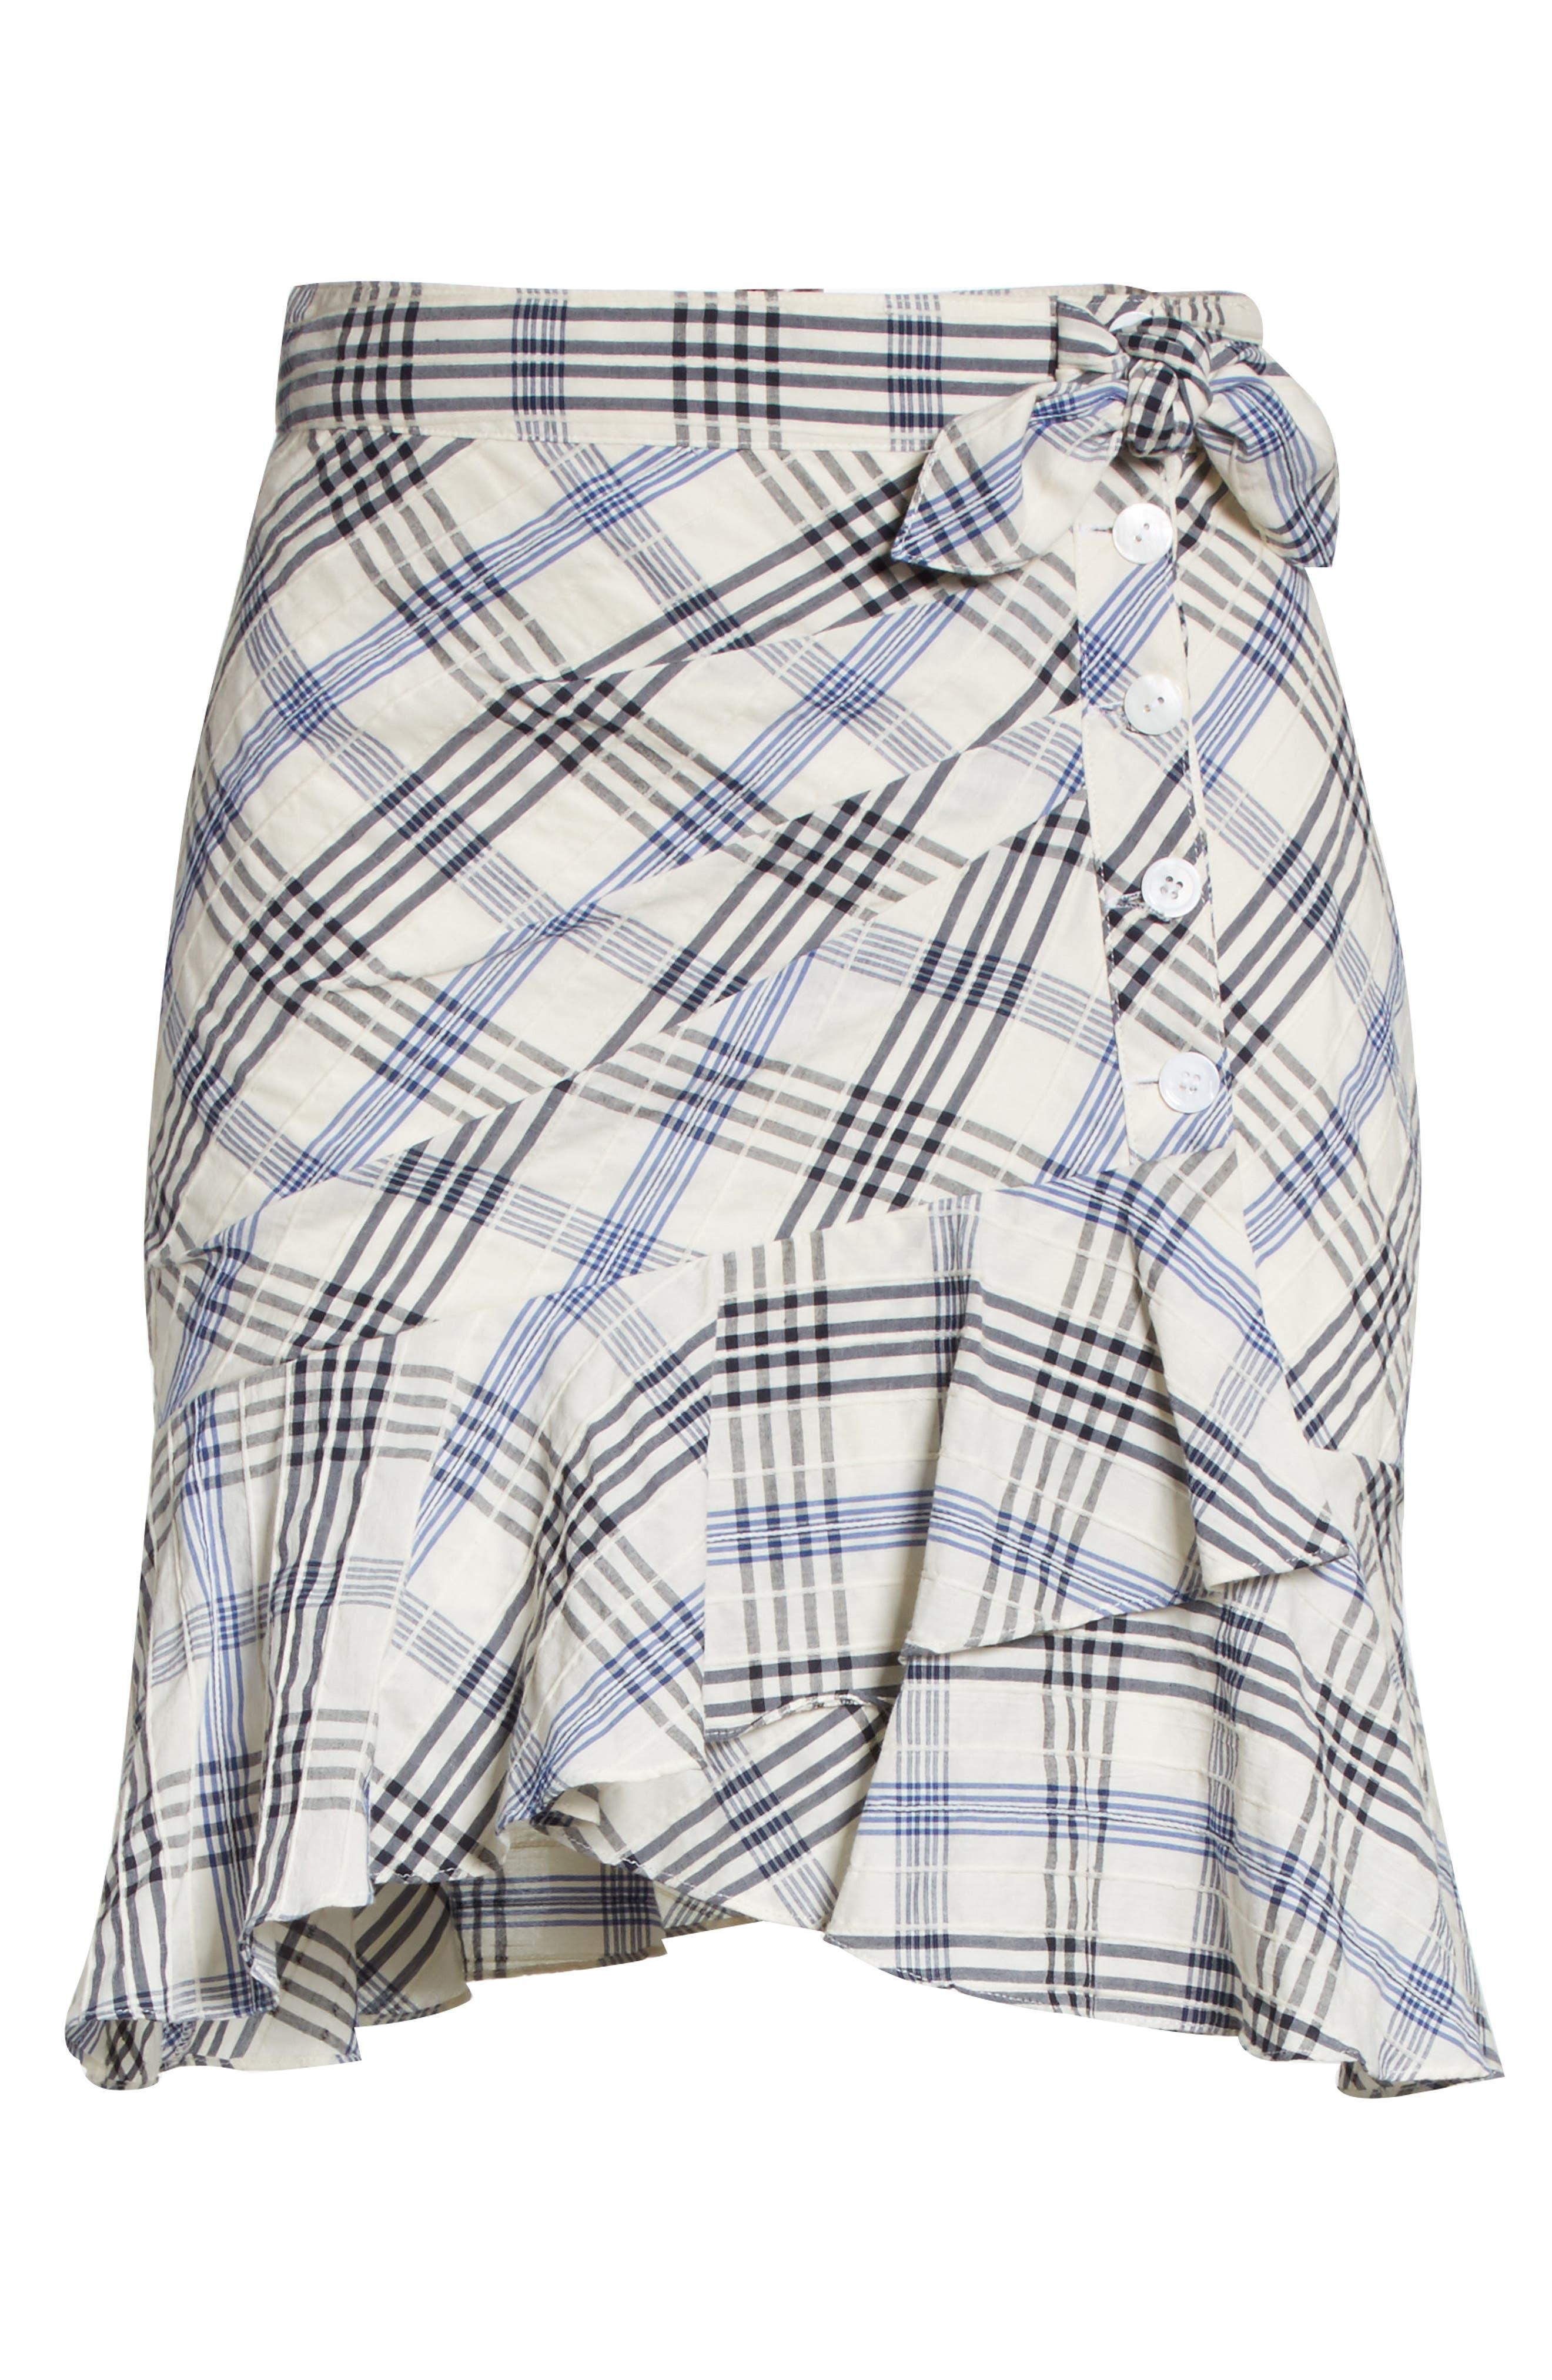 Kaia Check Ruffle Skirt,                             Alternate thumbnail 7, color,                             Blue